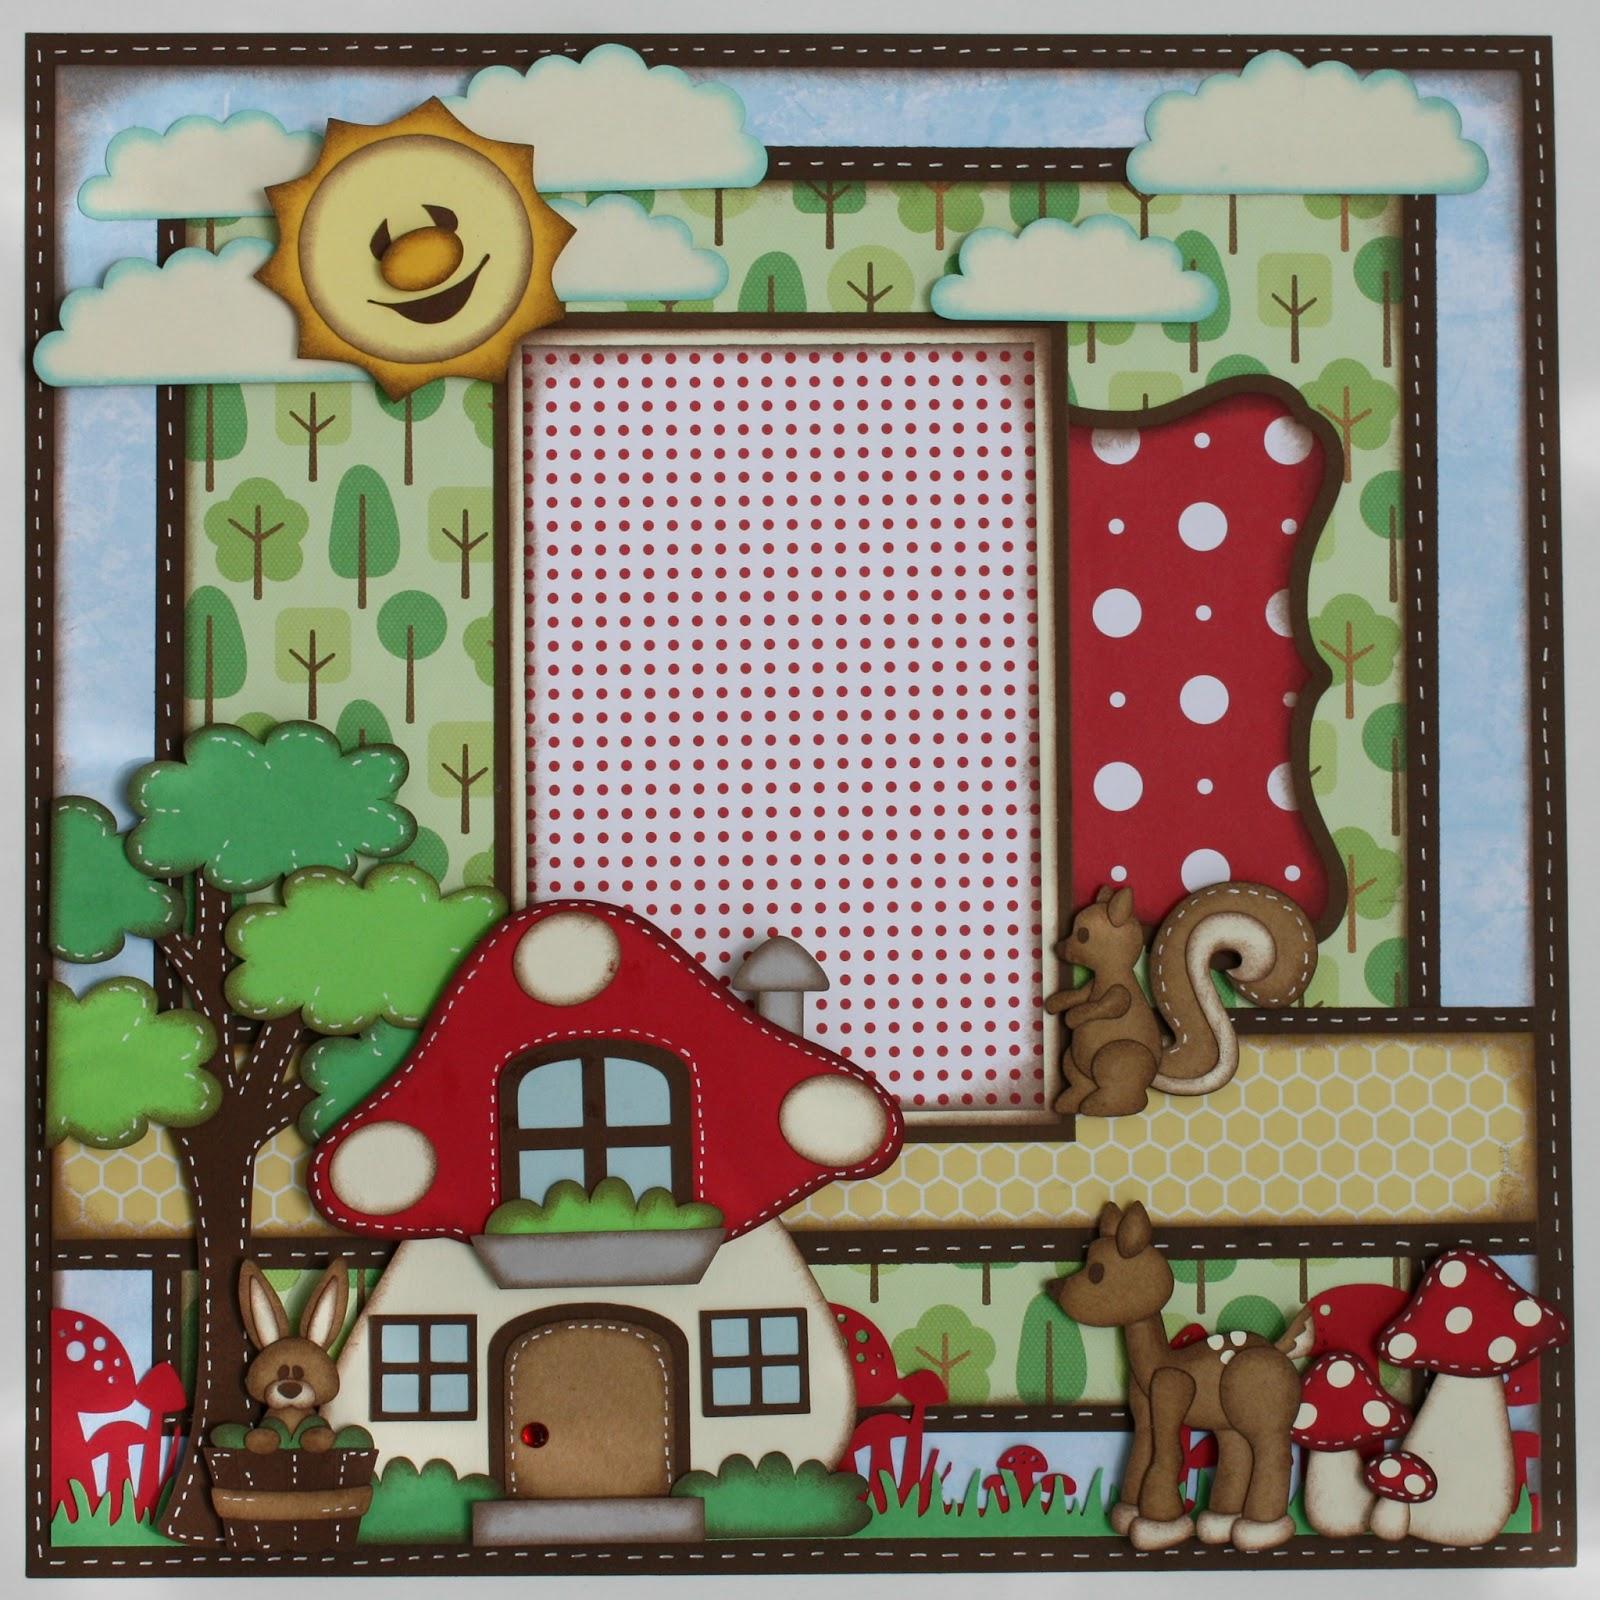 Scrapbook ideas and designs - Mushroom House 12x12 Single Scrapbook Page Layout